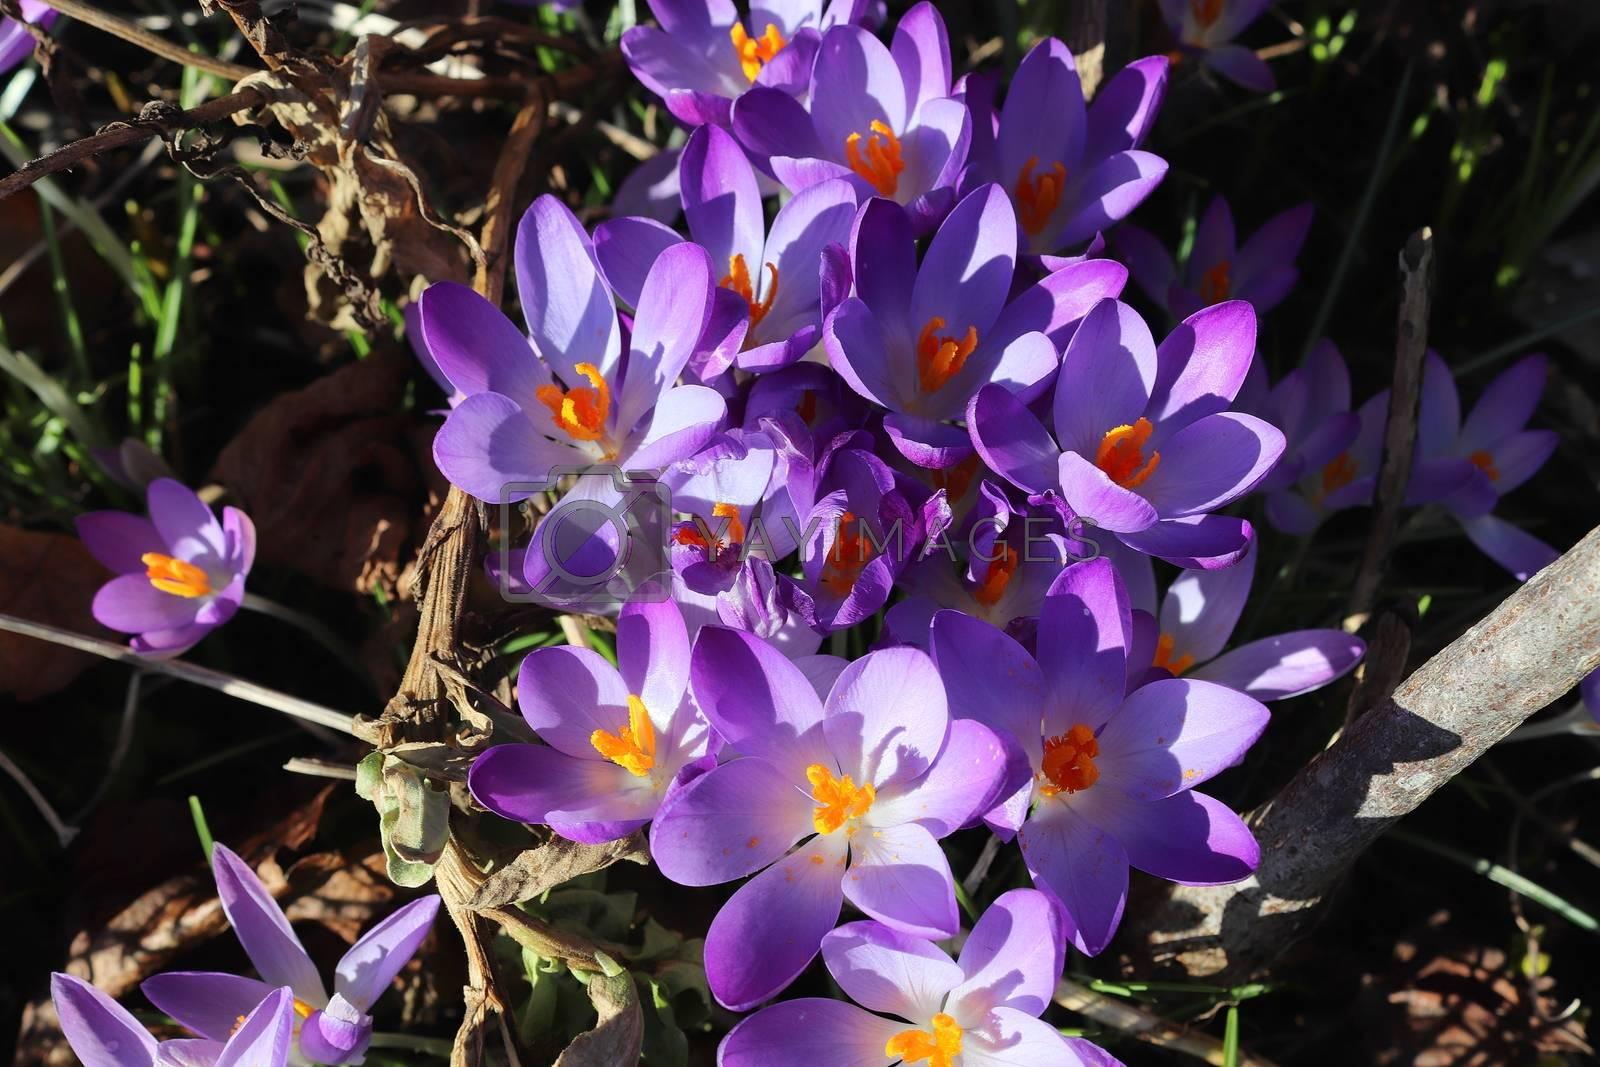 View at magic blooming spring flowers crocus sativus. Purple cro by MP_foto71